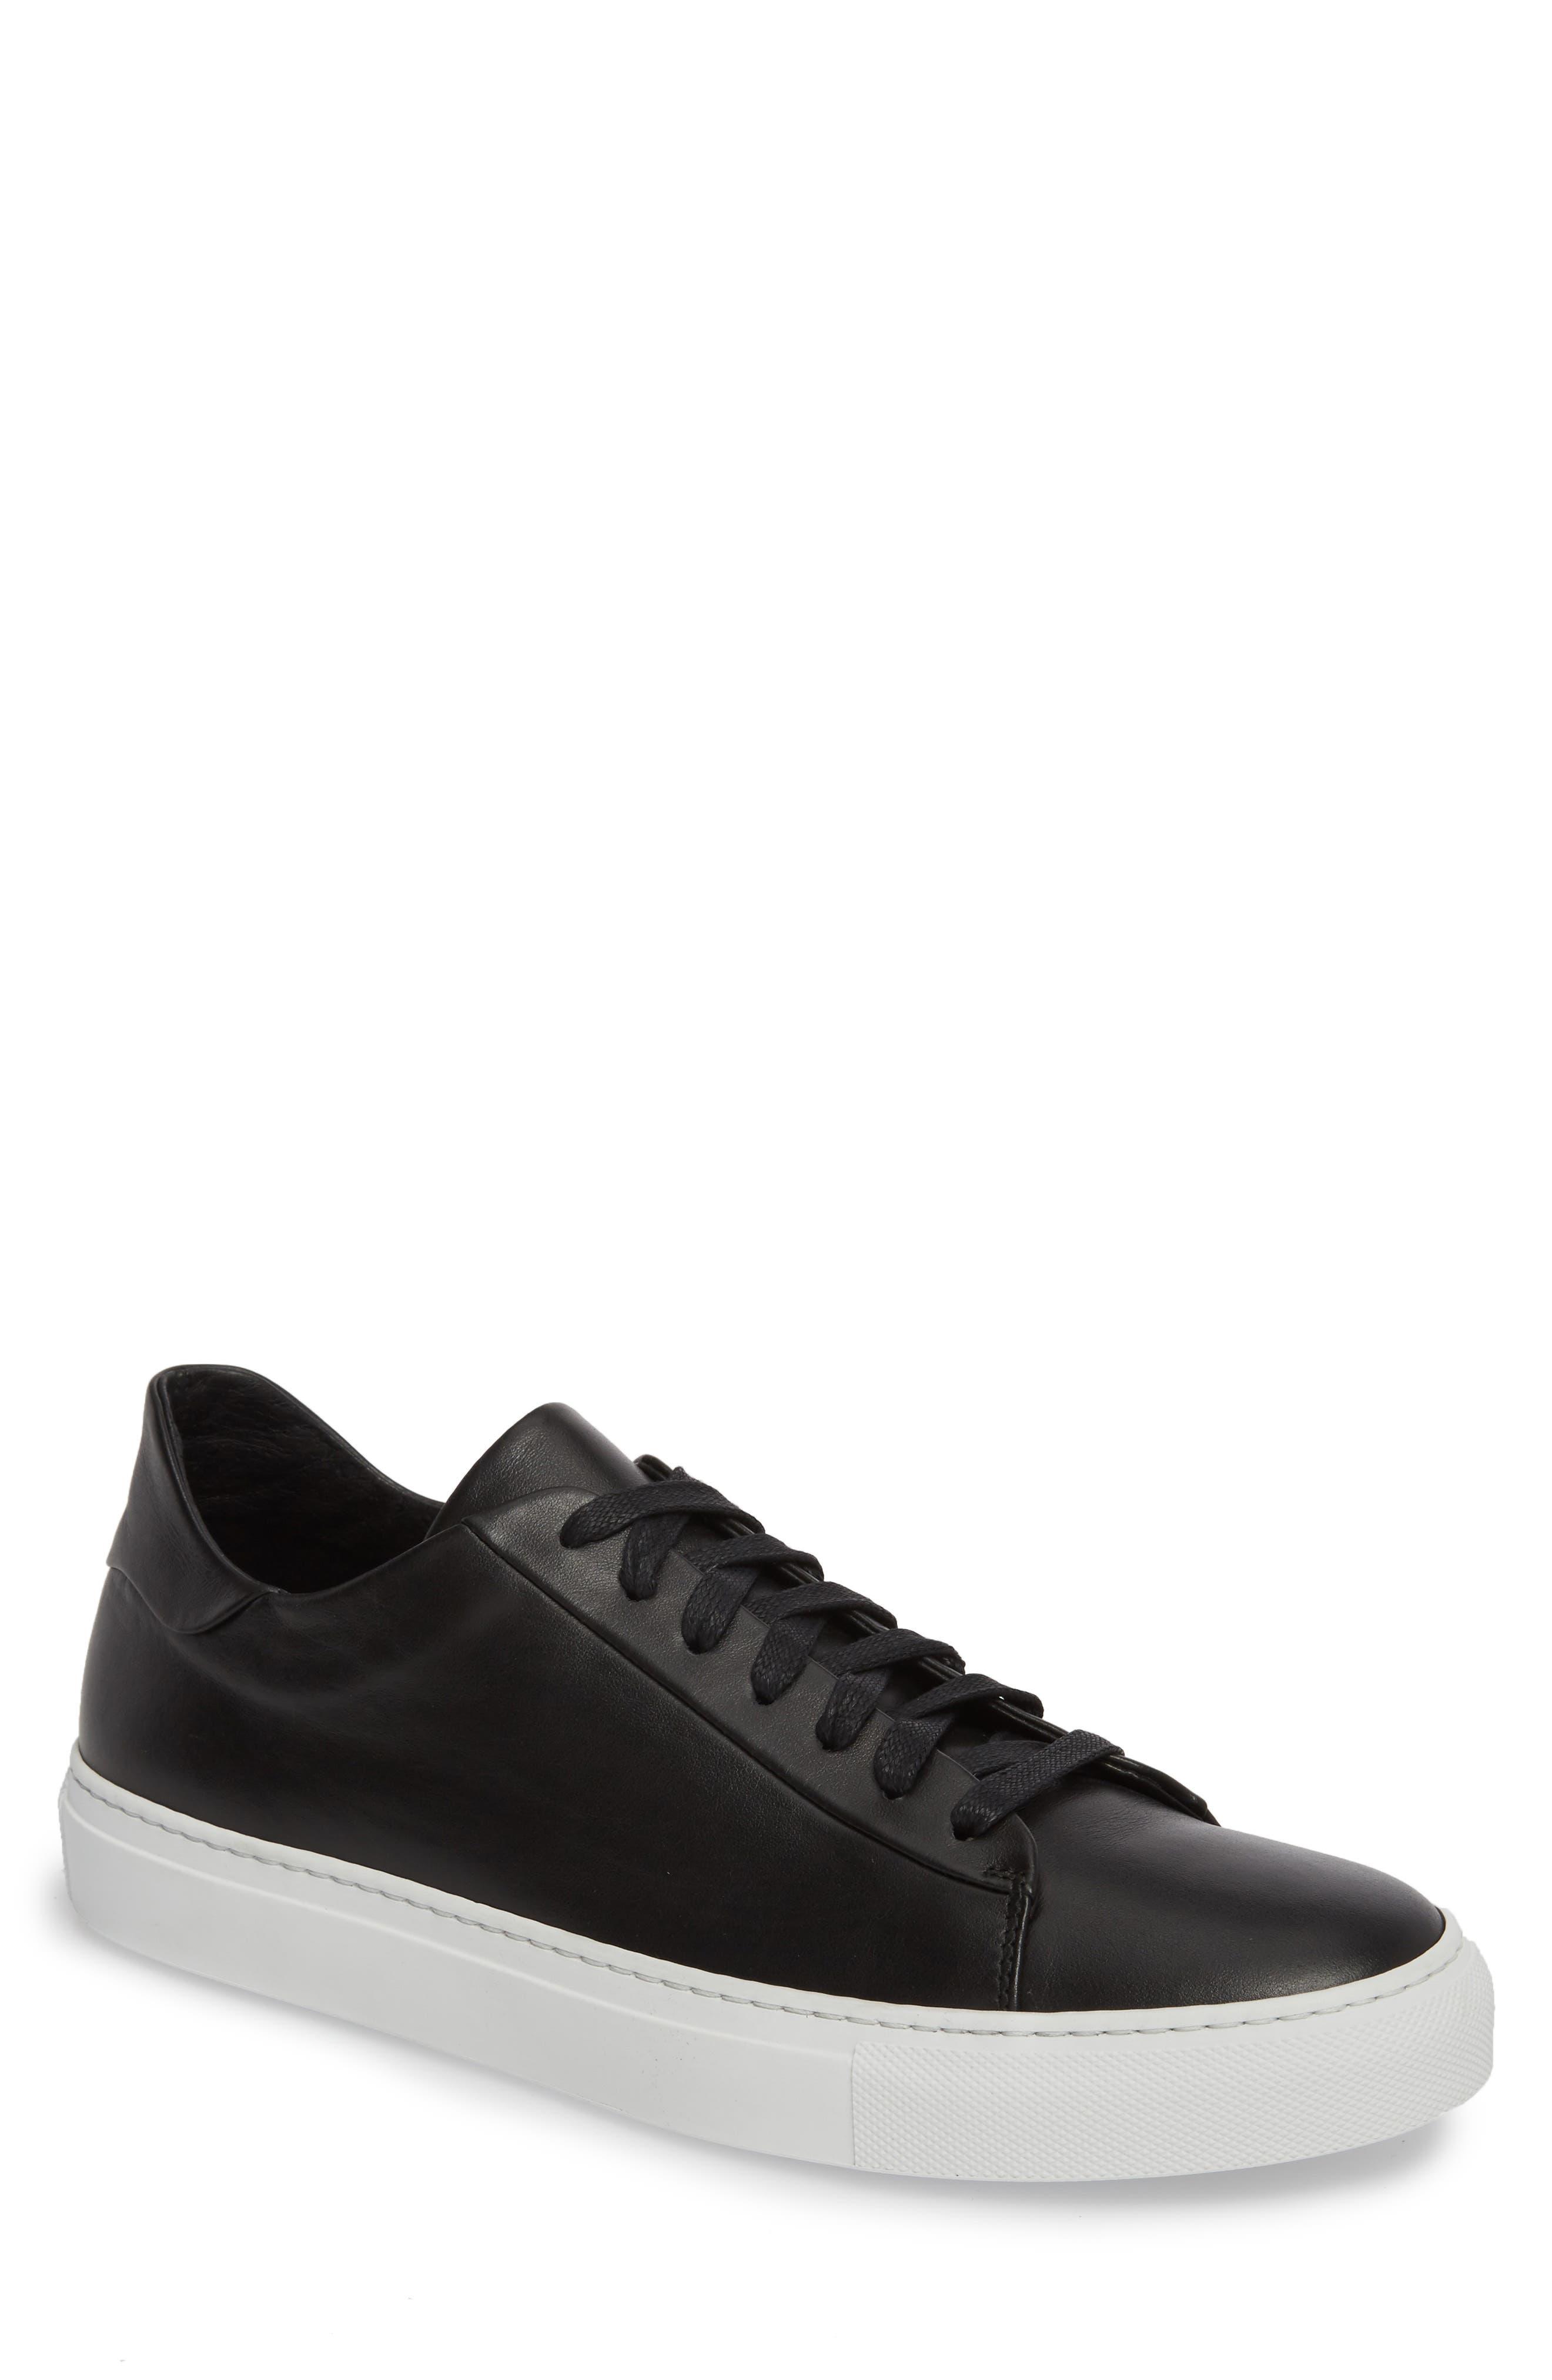 Court Sneaker,                         Main,                         color,